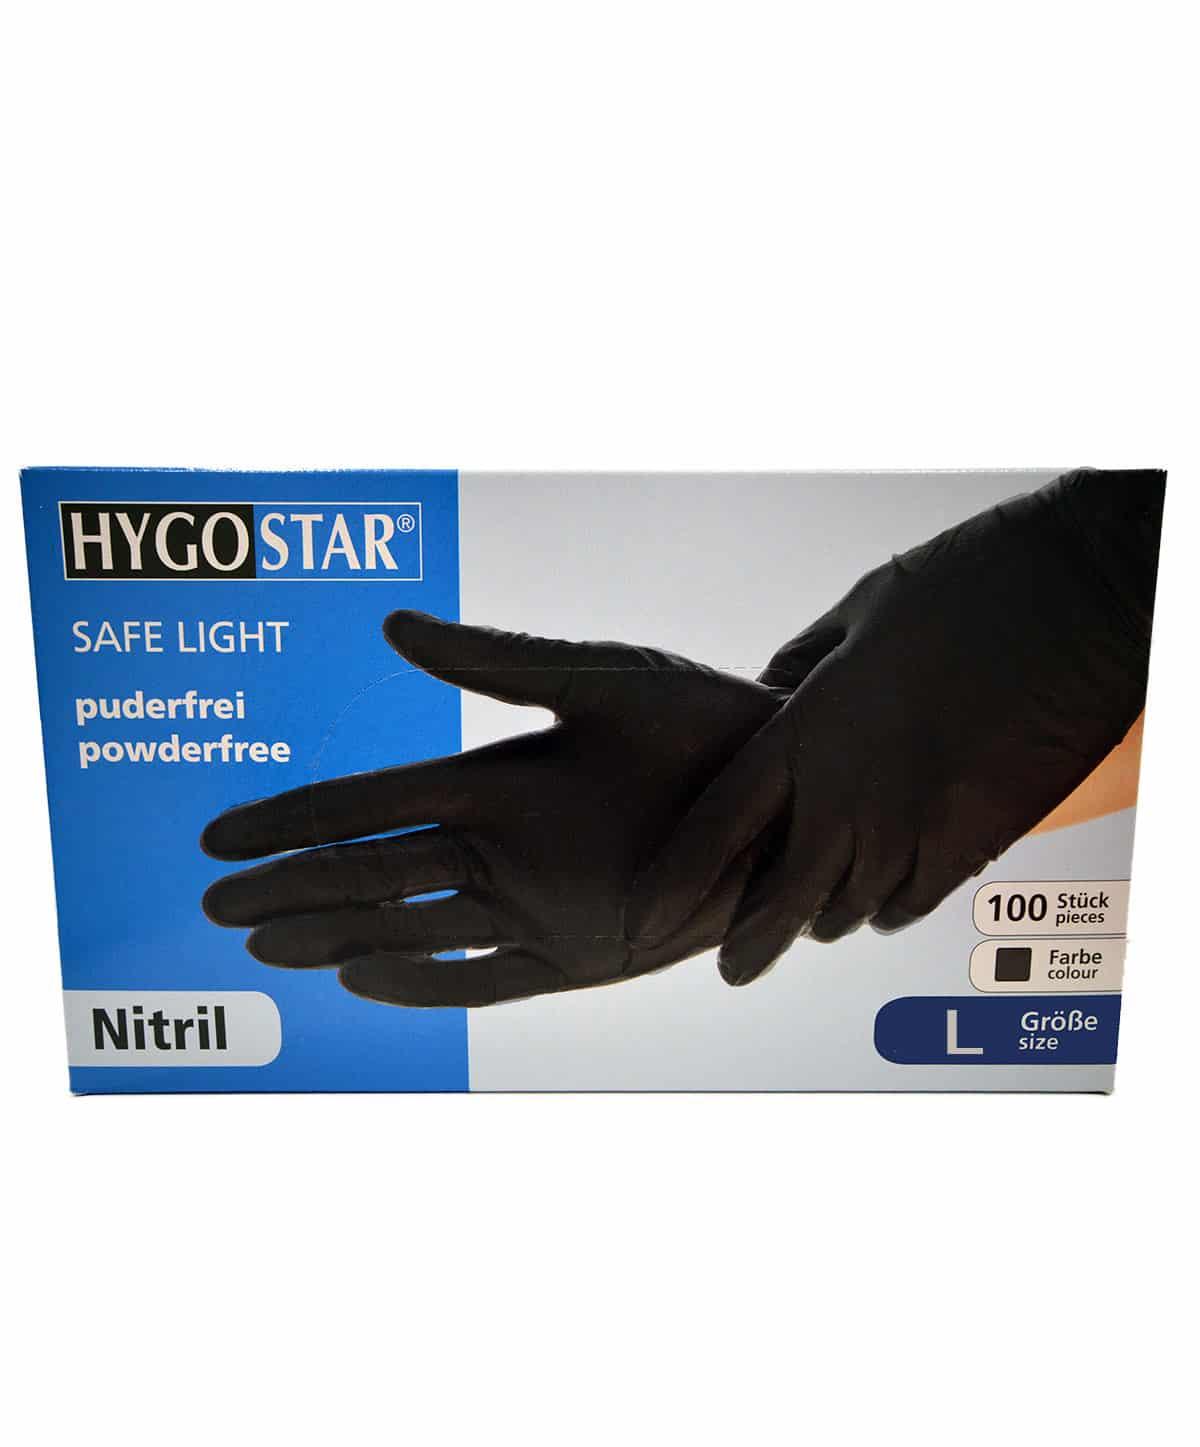 Airsoft 9 Handschuh Hanting Nitril Gr Funsport